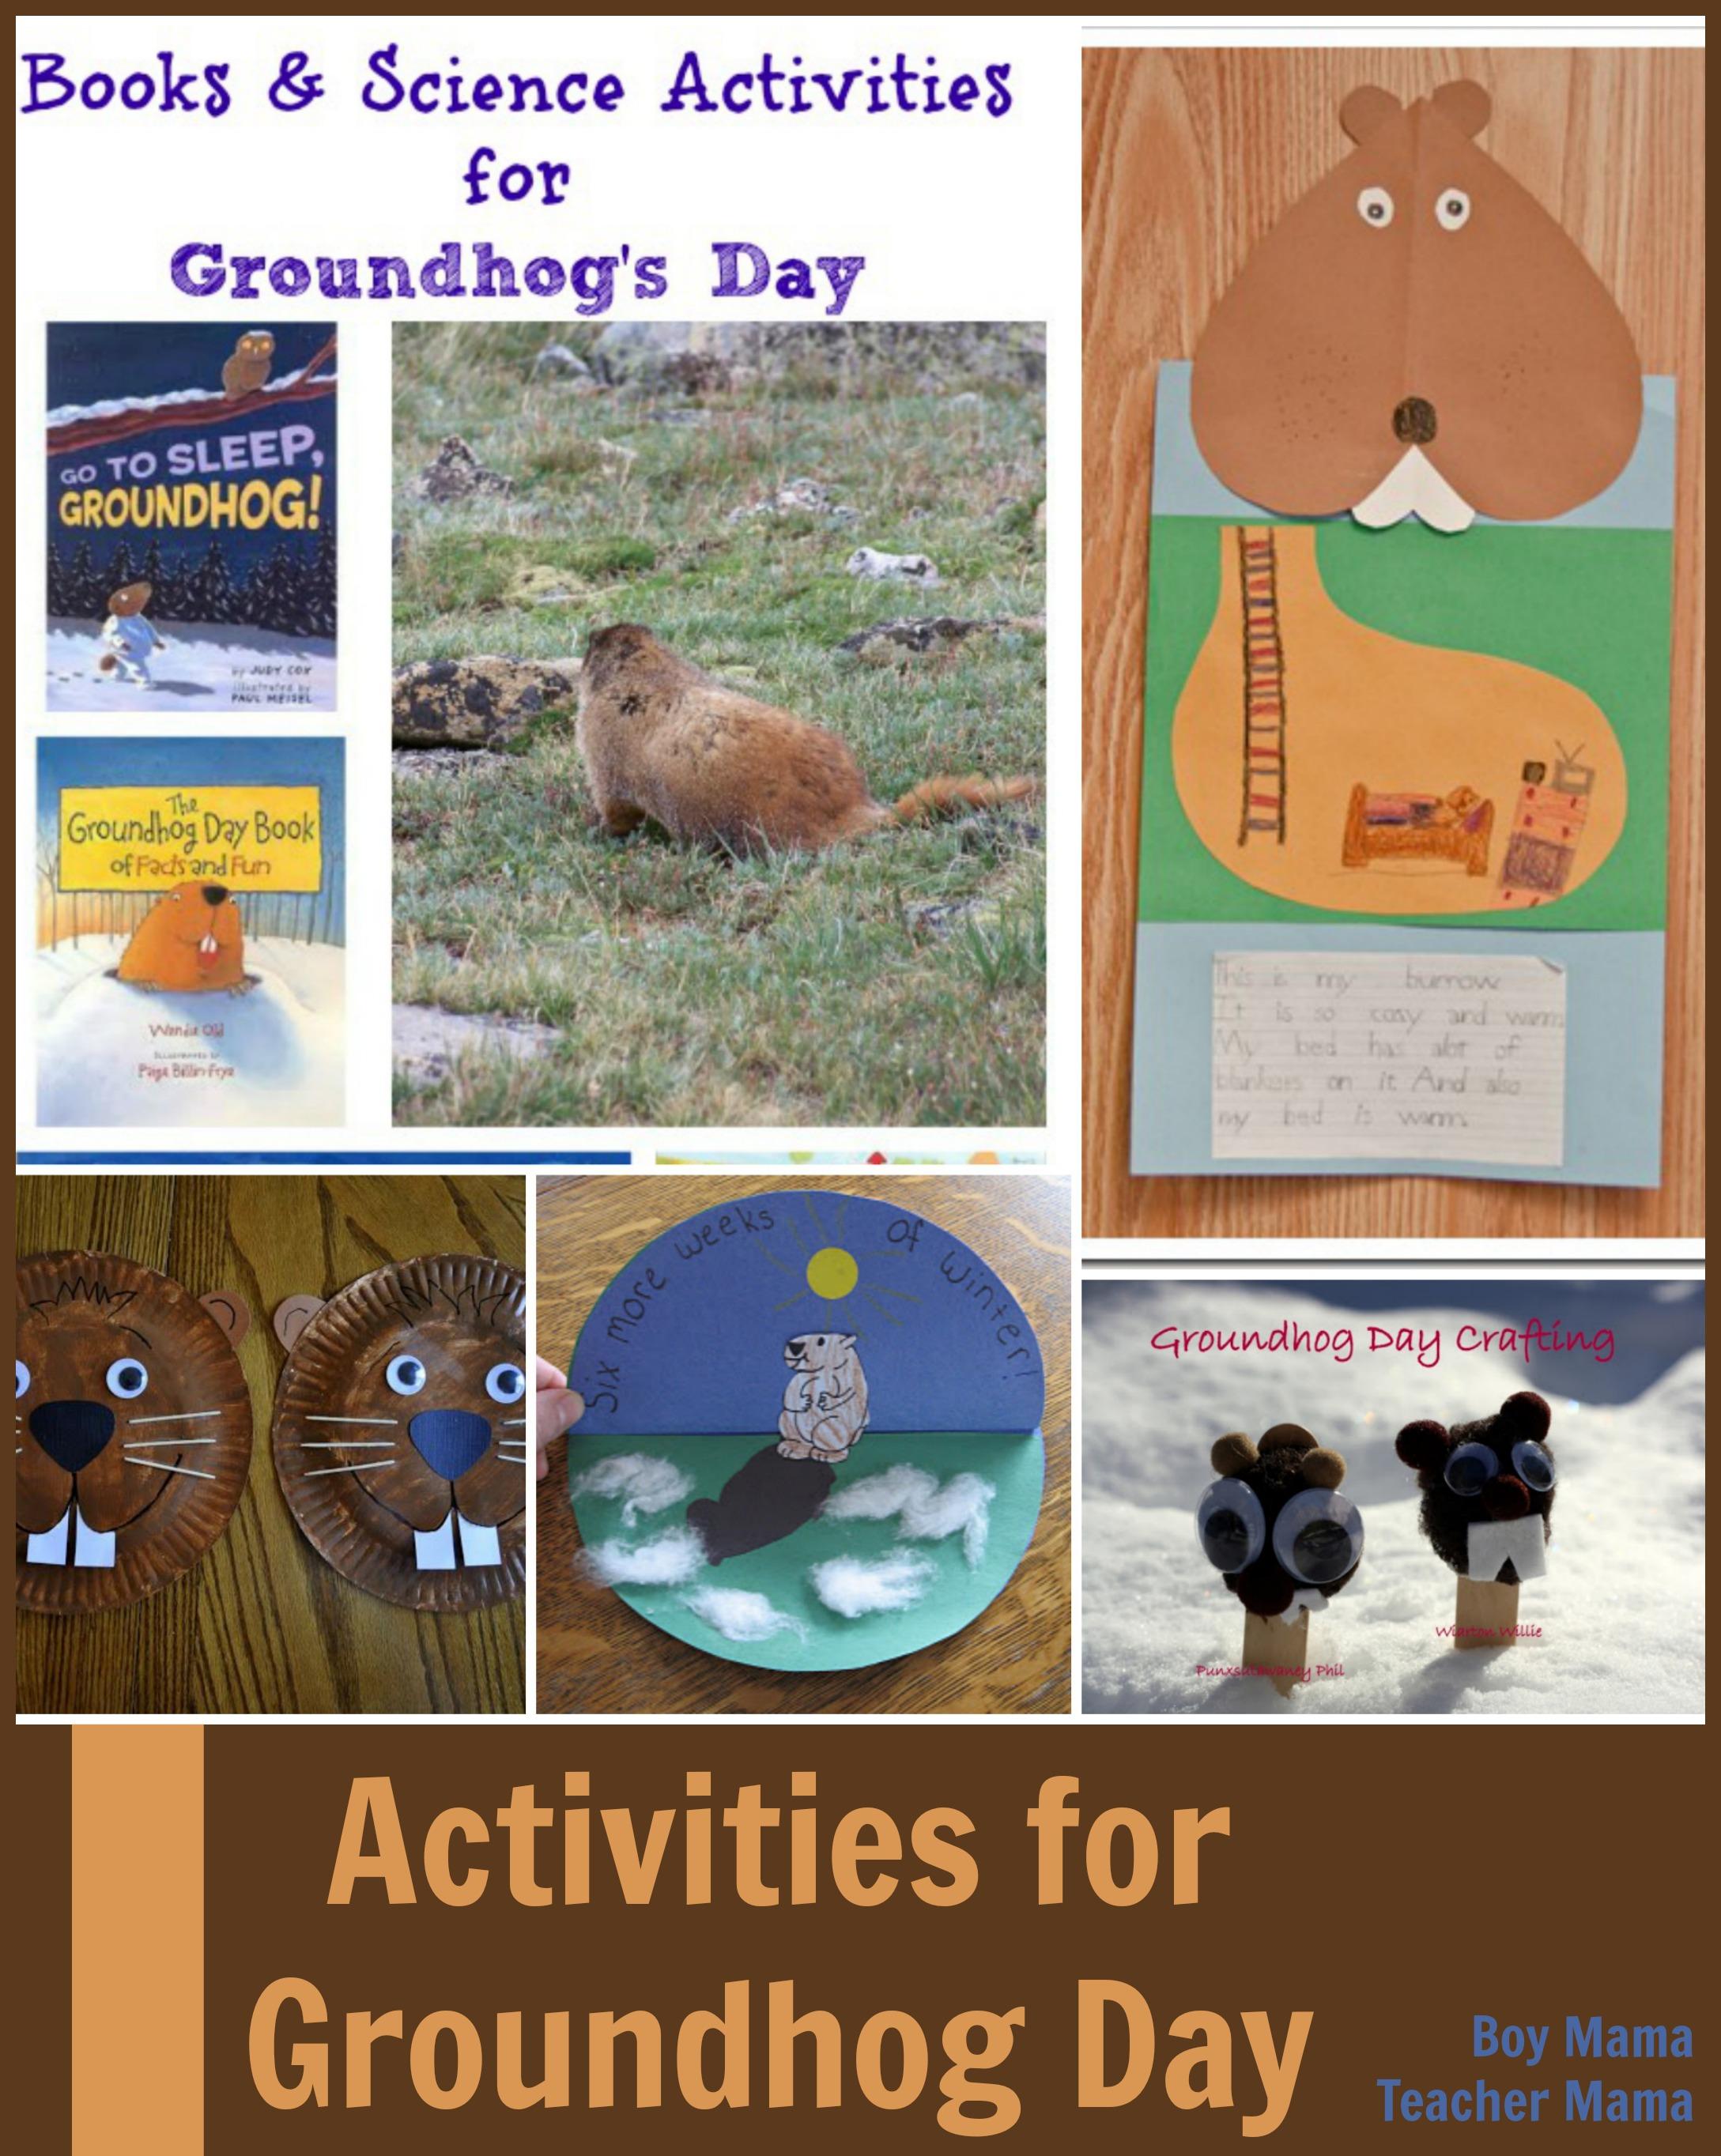 Boy Mama Teacher Mama Groundhog Day